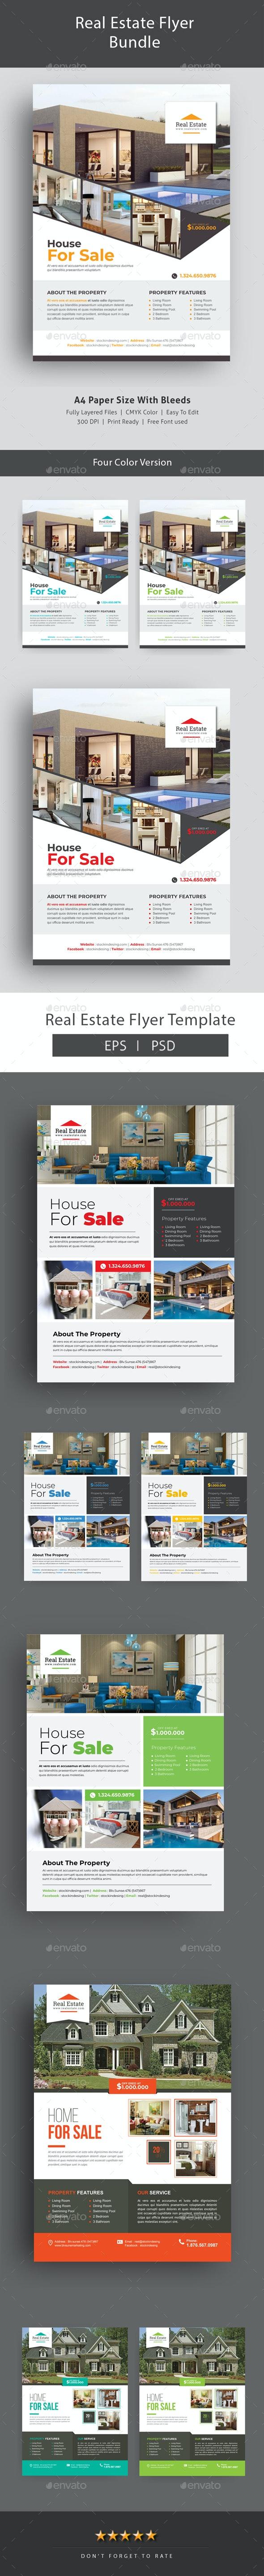 Real Estate Flyer Bundle - Corporate Flyers